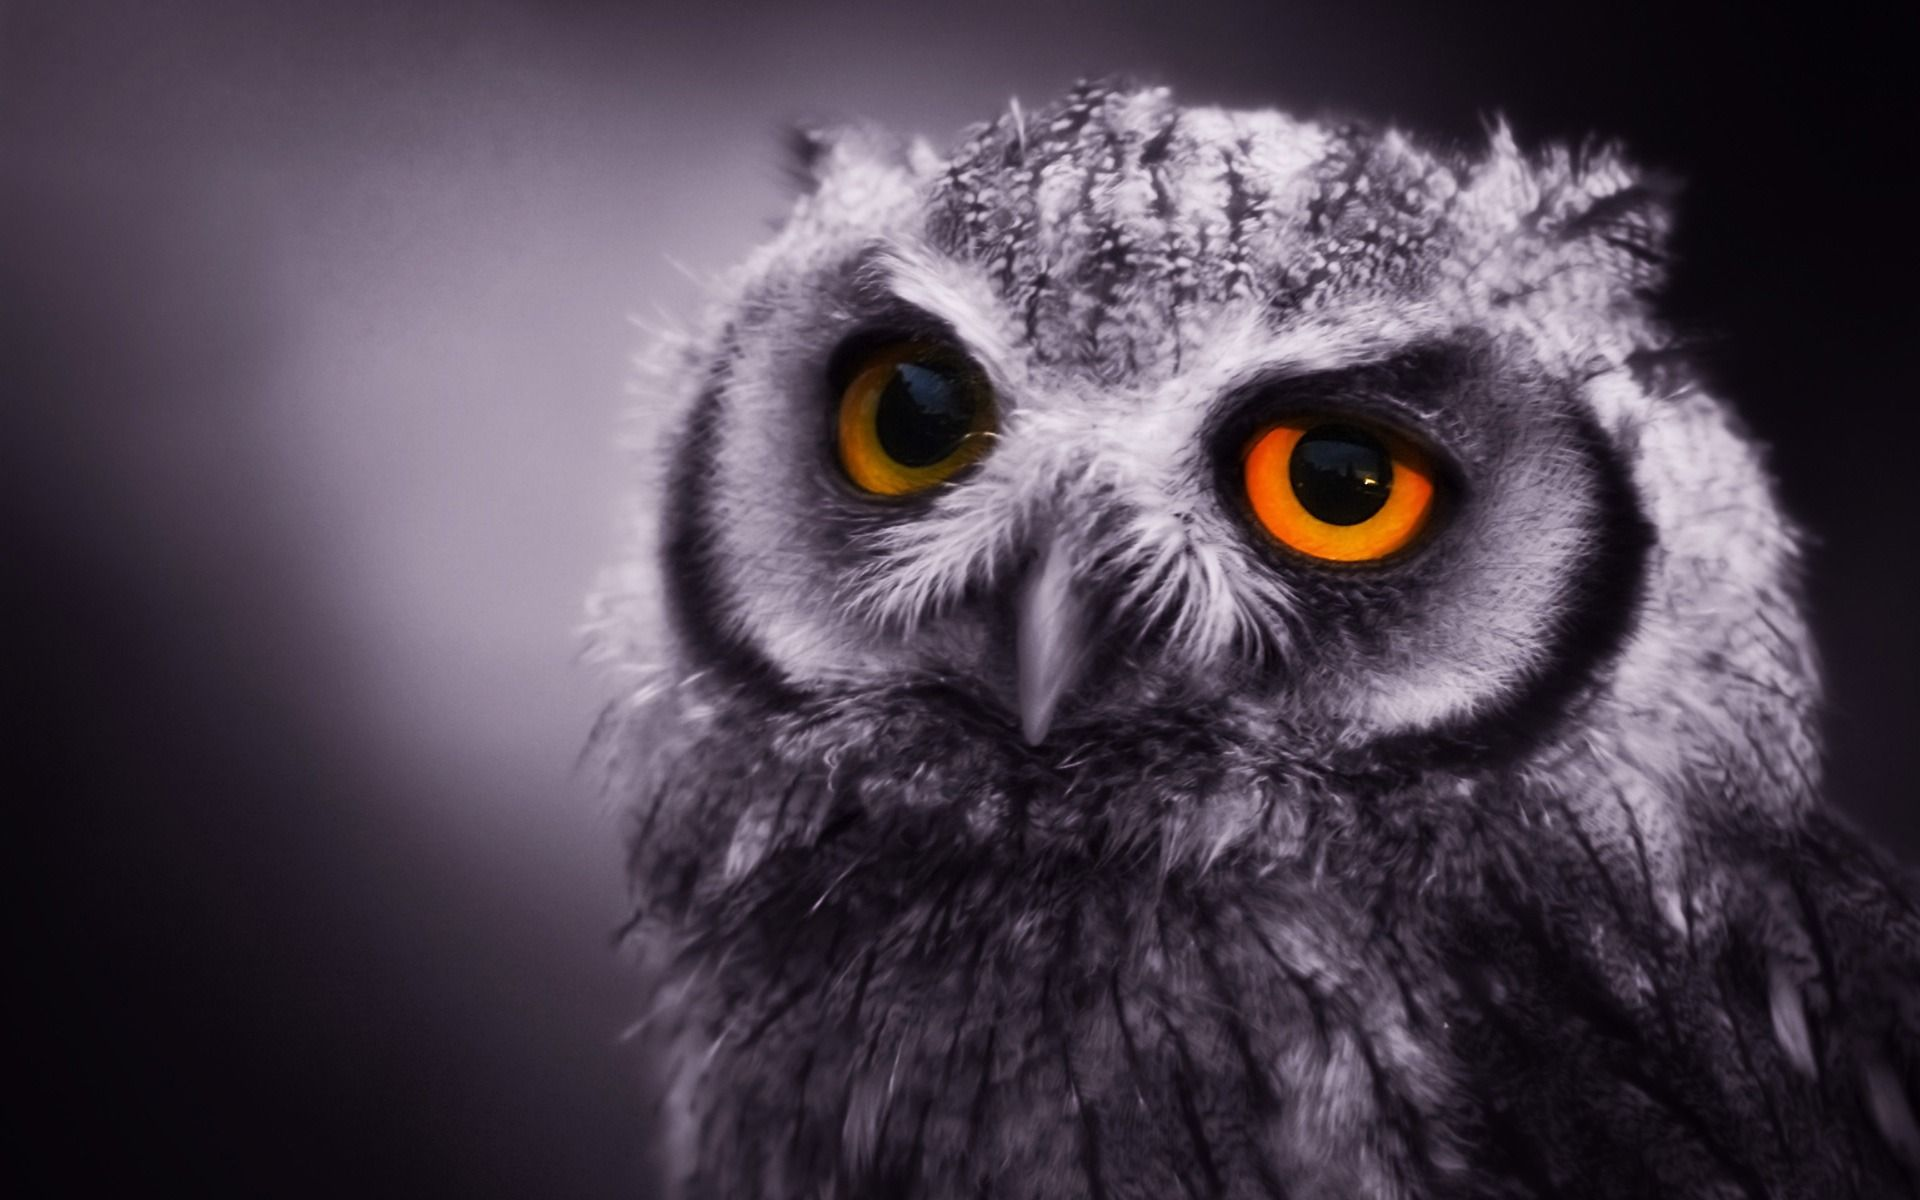 iphone wallpaper owl